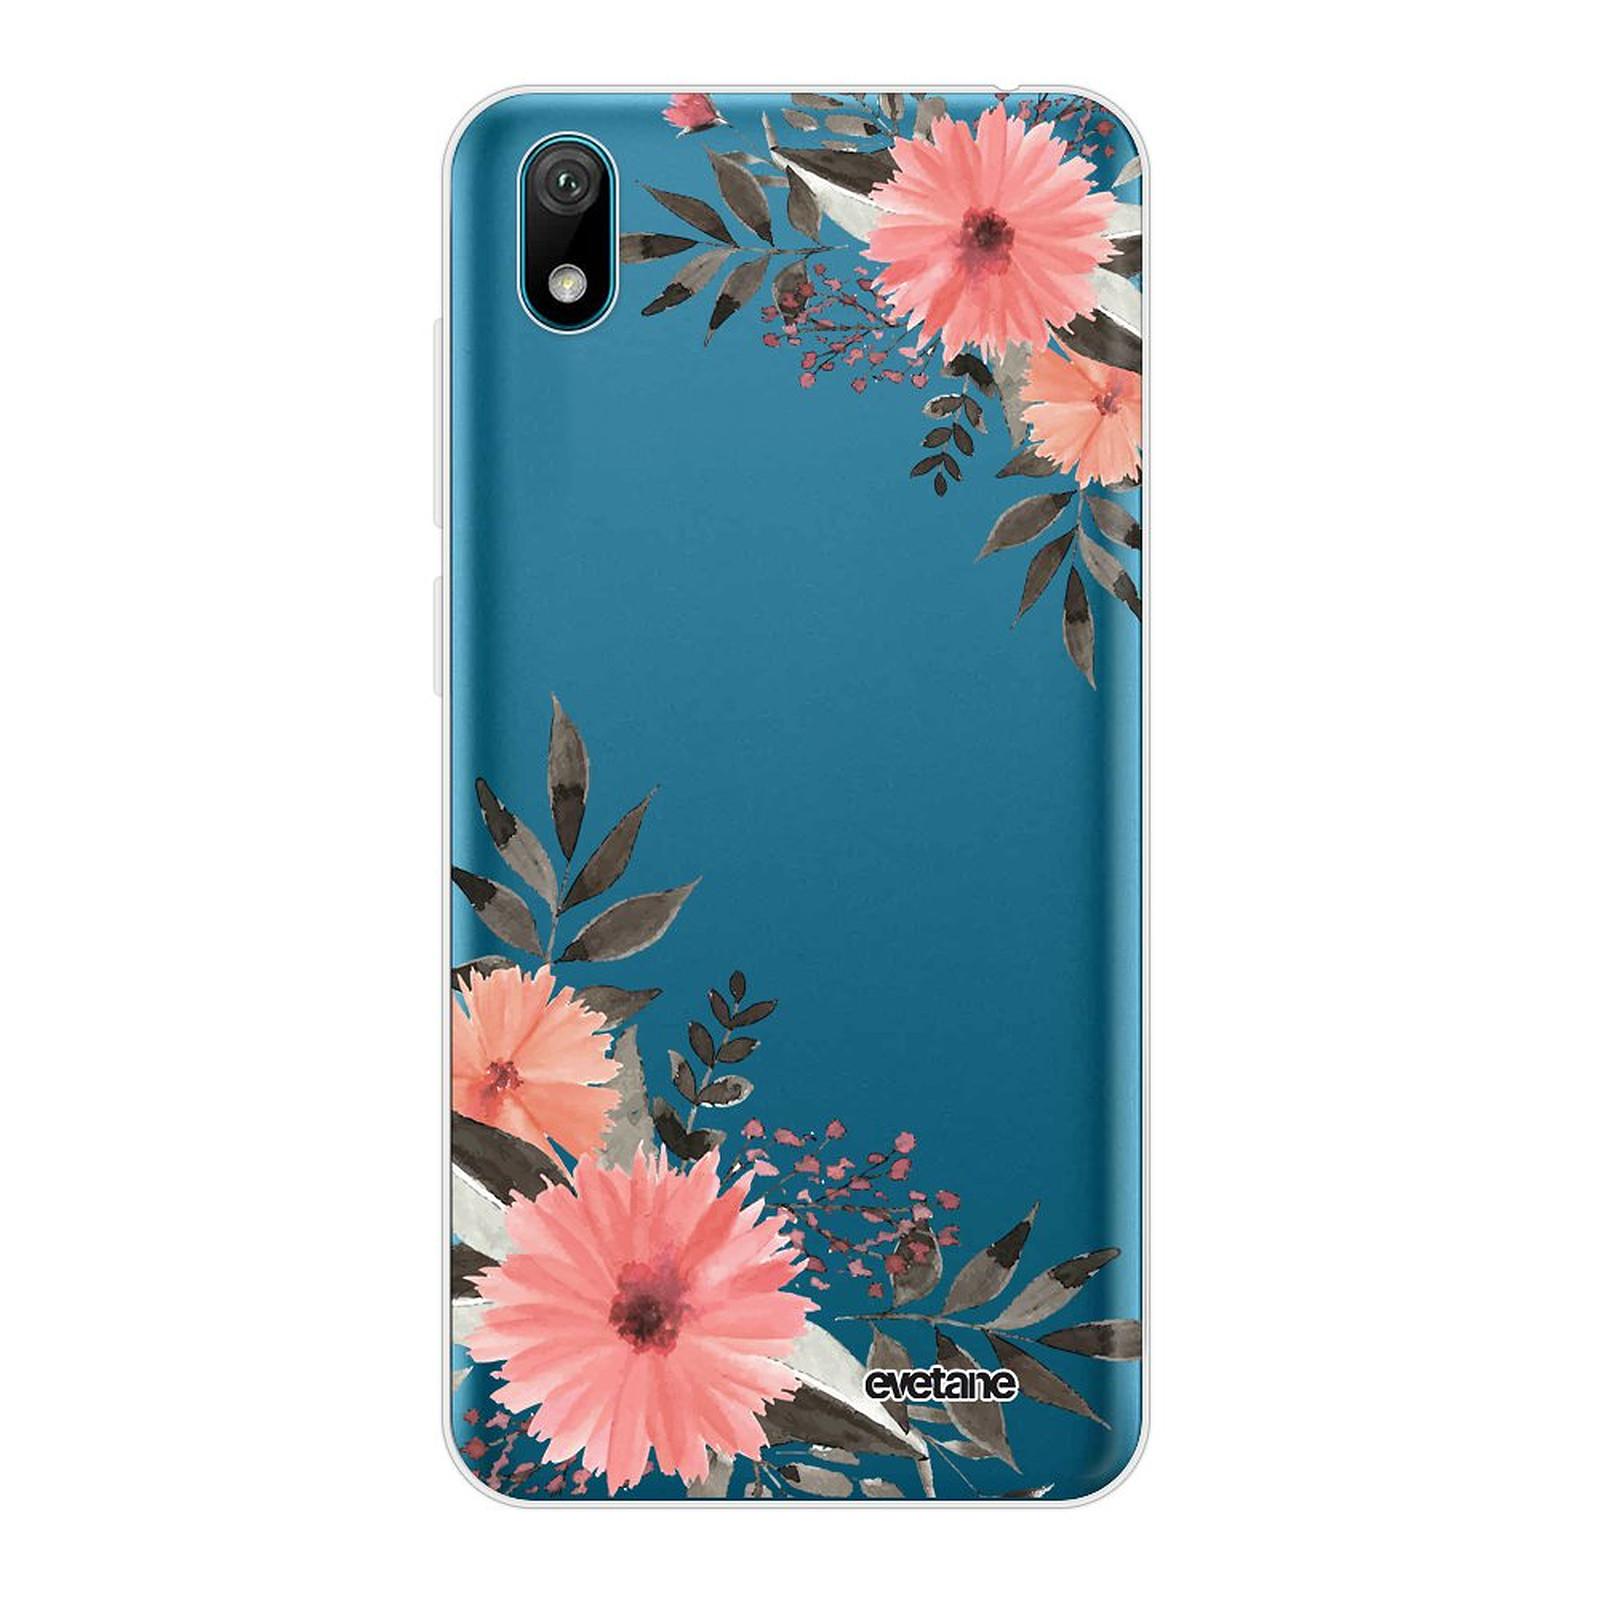 EVETANE Coque Huawei Y5 2019 souple transparente Fleurs roses - Coque téléphone Evetane sur LDLC